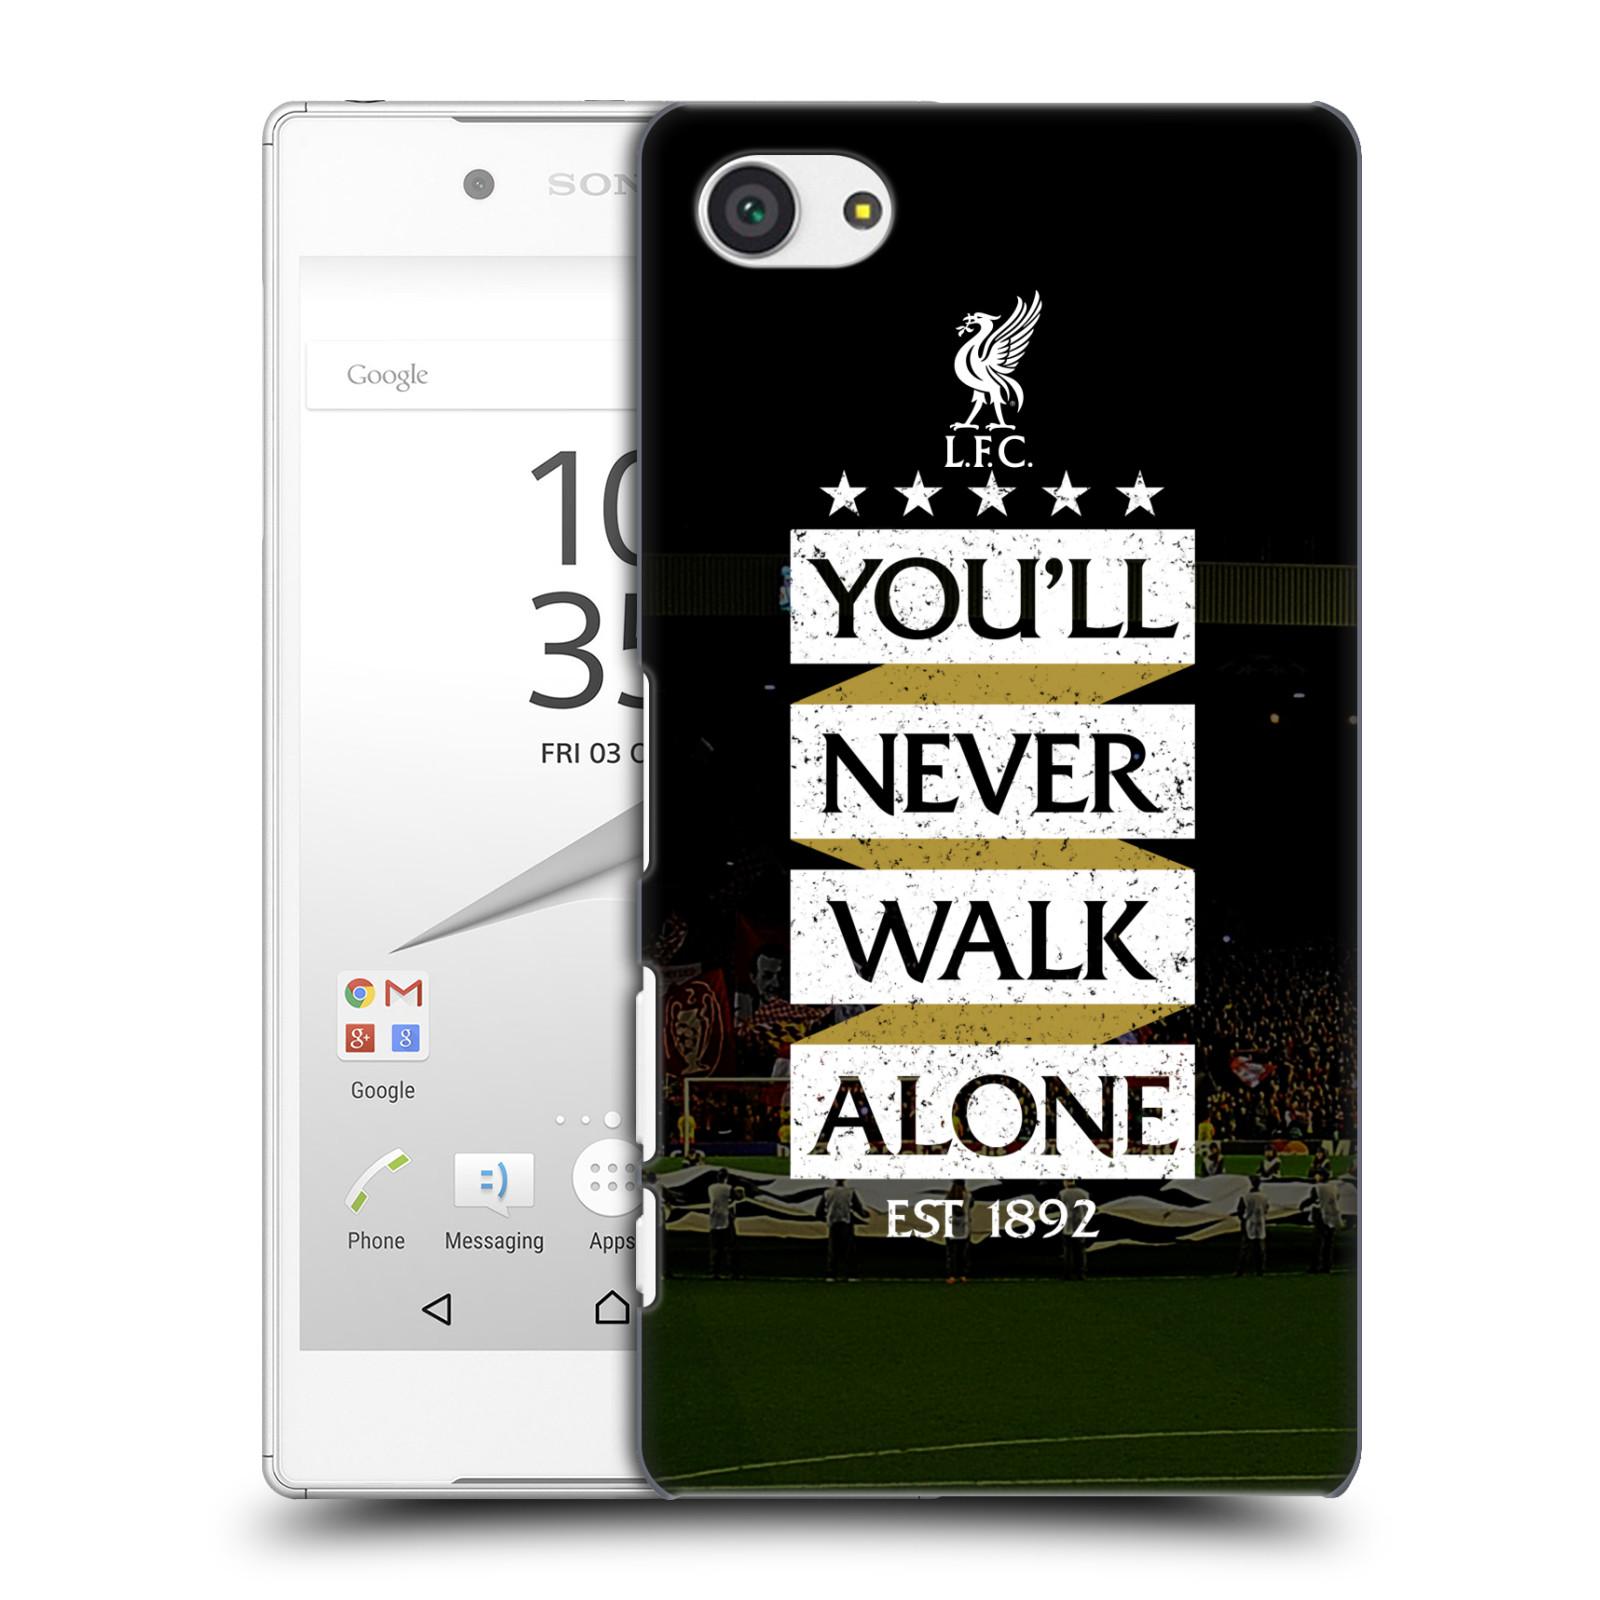 Plastové pouzdro na mobil Sony Xperia Z5 Compact HEAD CASE LFC You'll Never Walk Alone